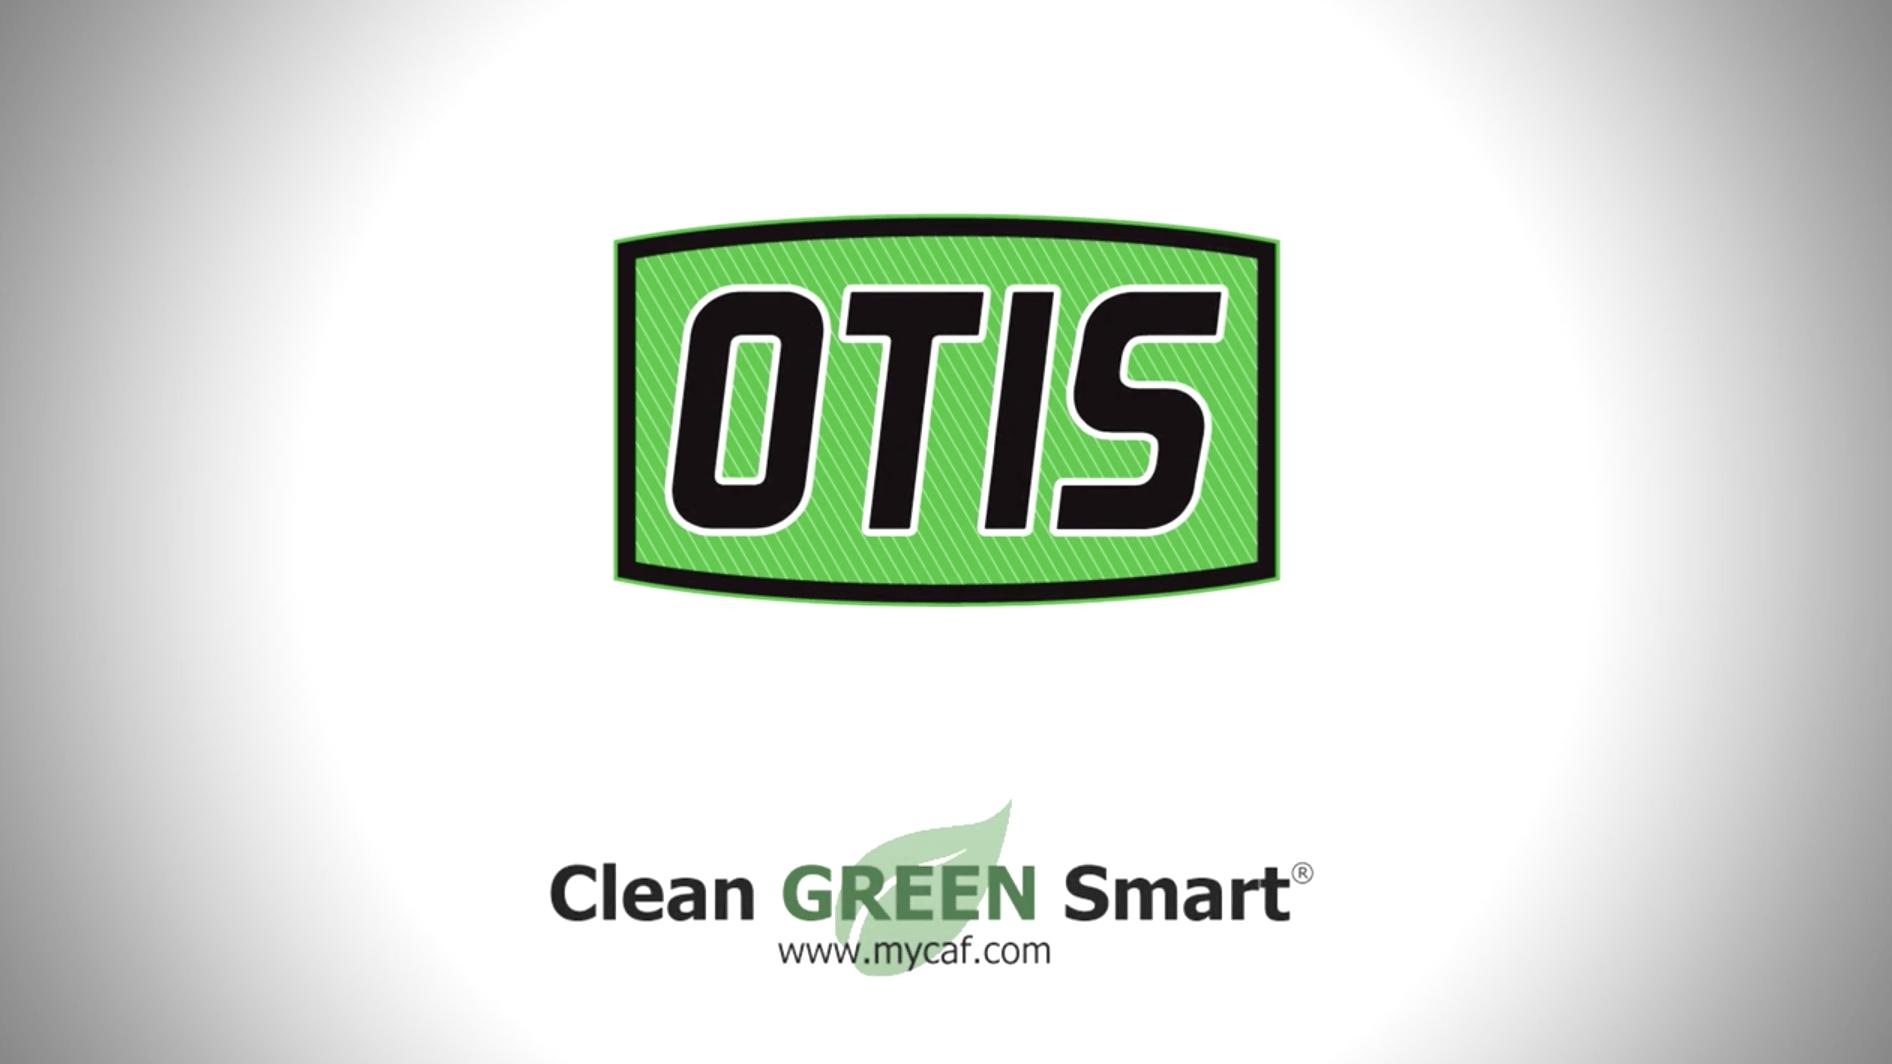 OTIS video 1